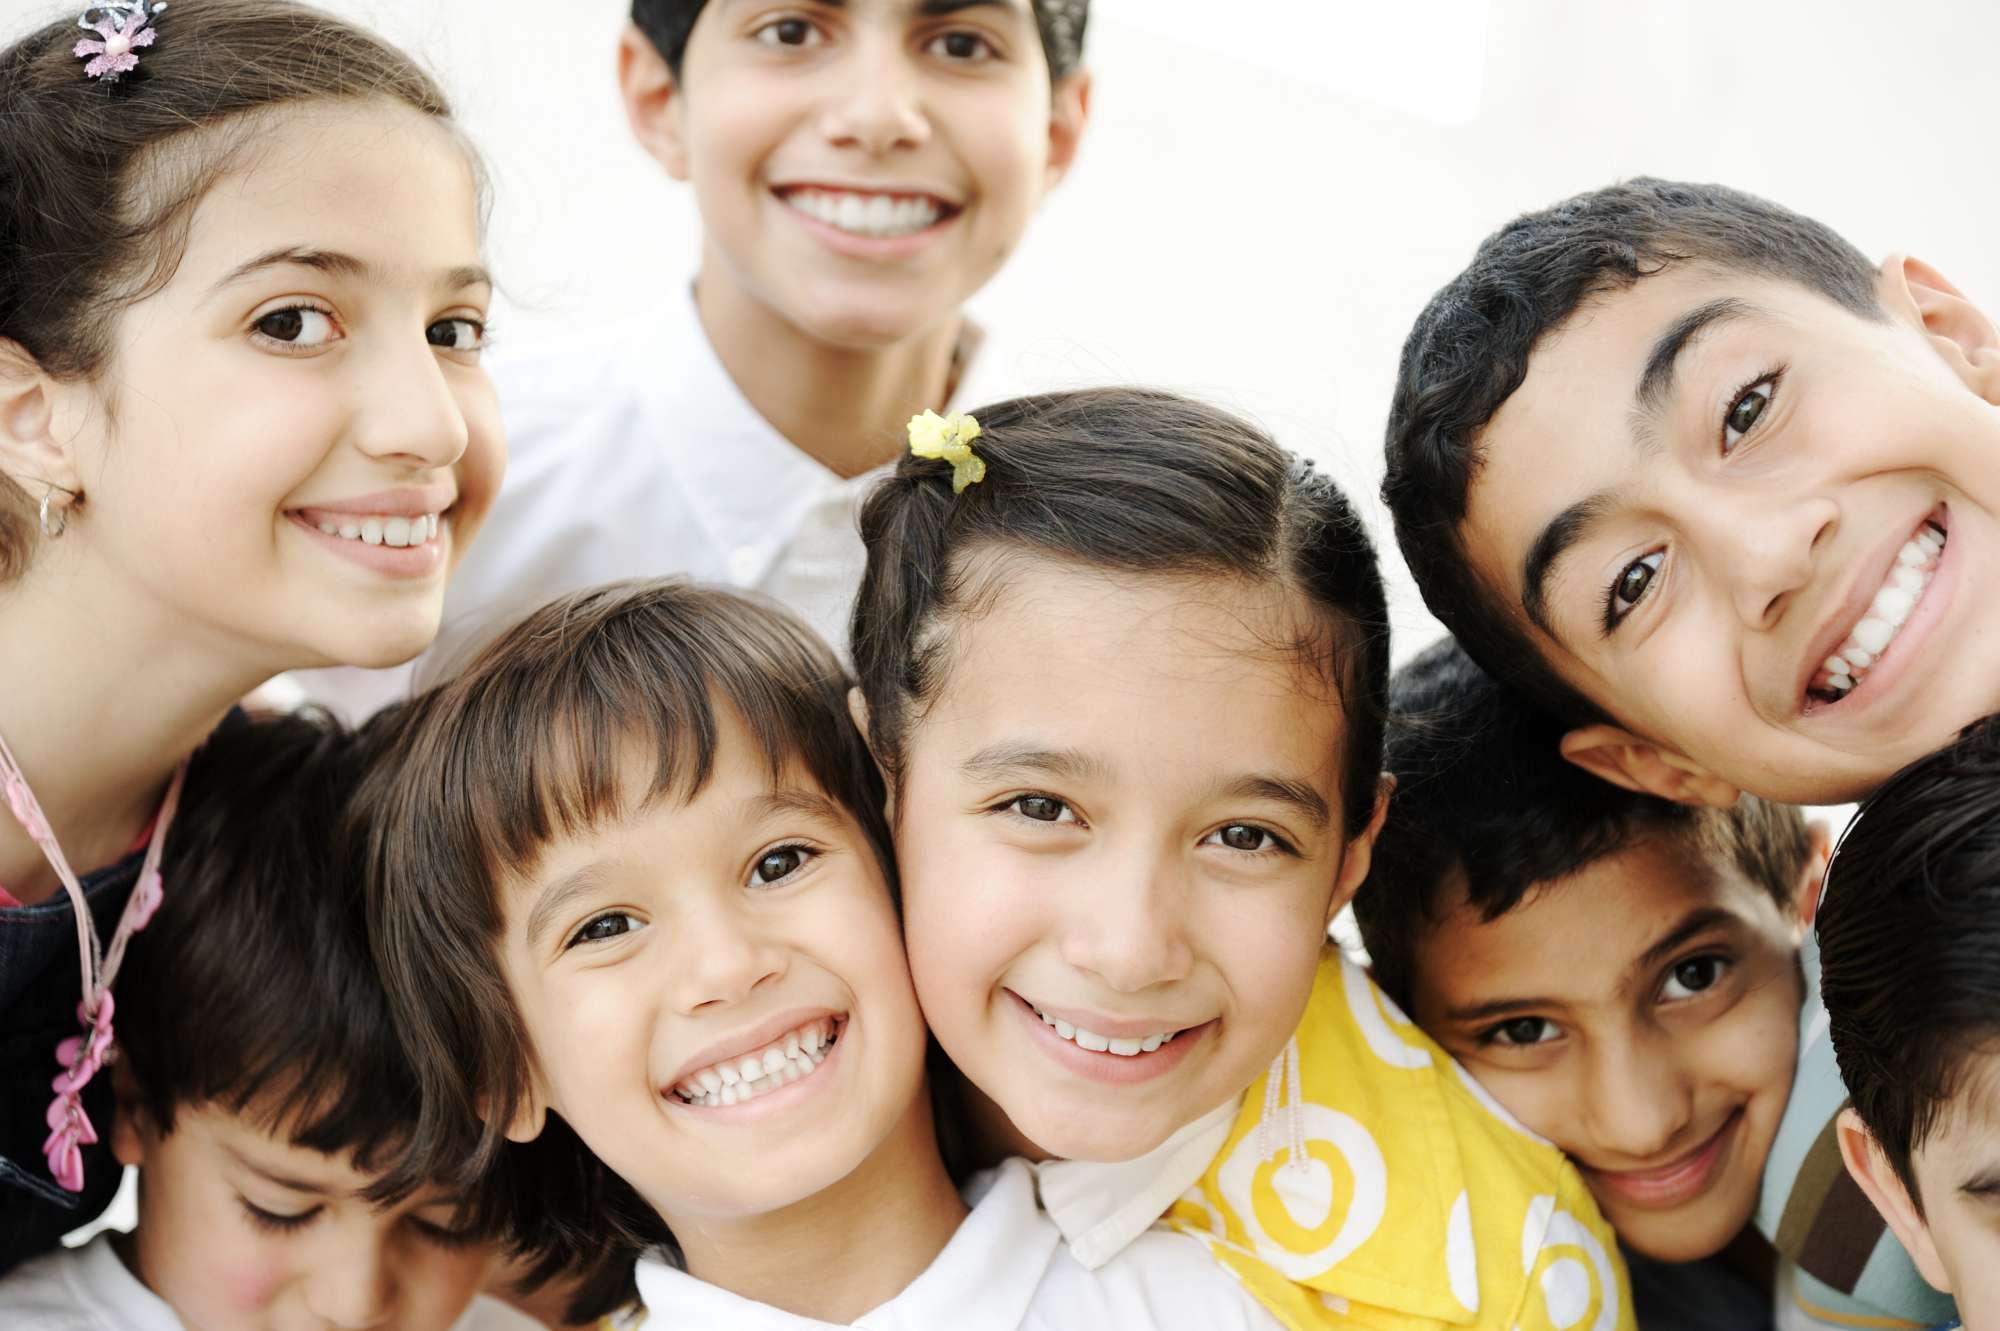 The Children of God Tomorrow